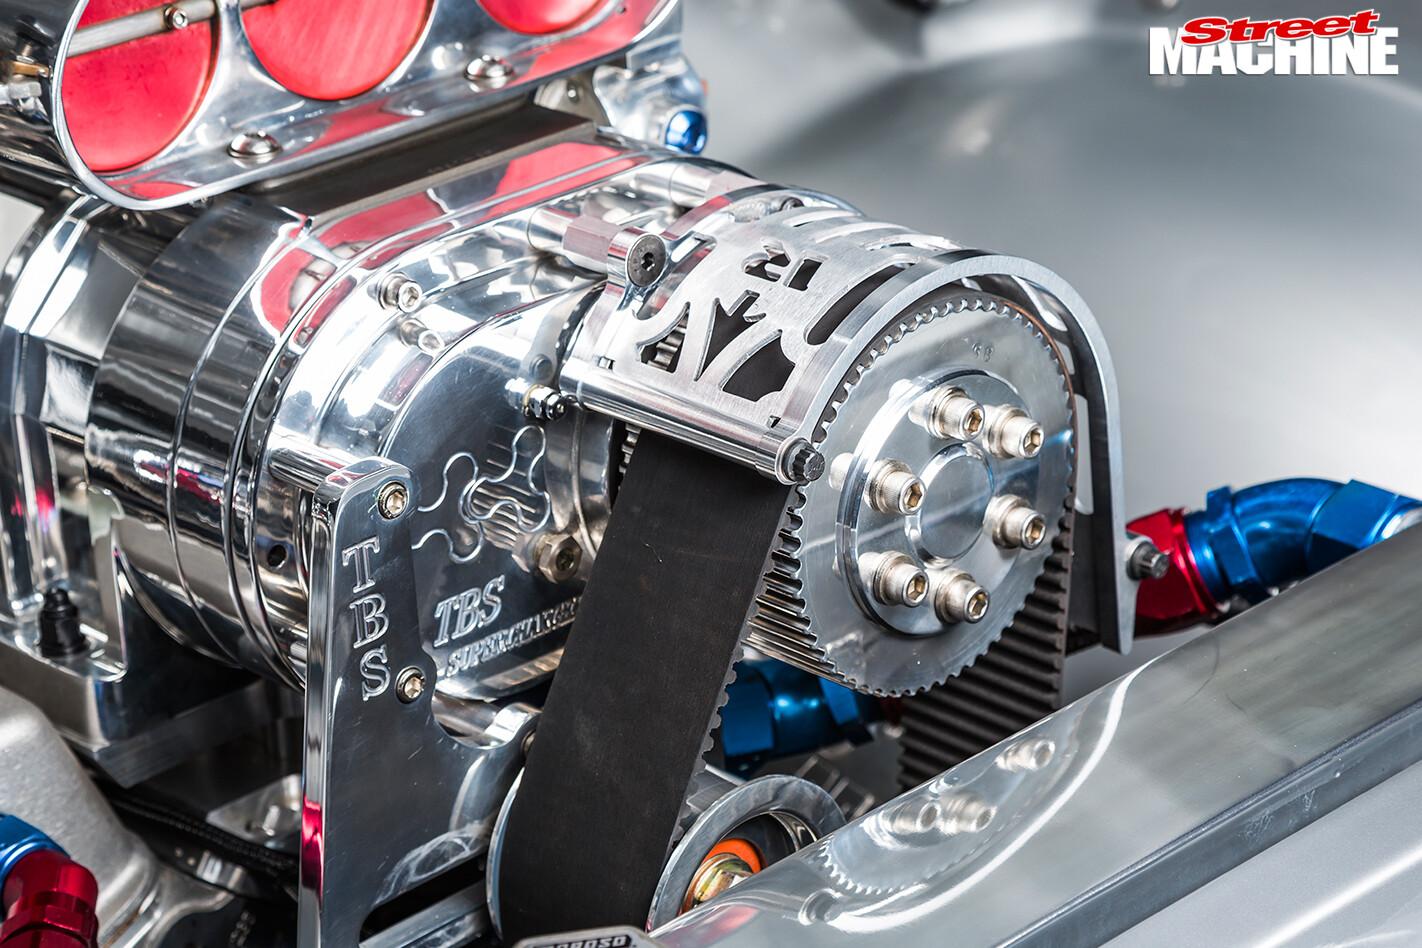 Holden -HG-Monaro -engine -blower